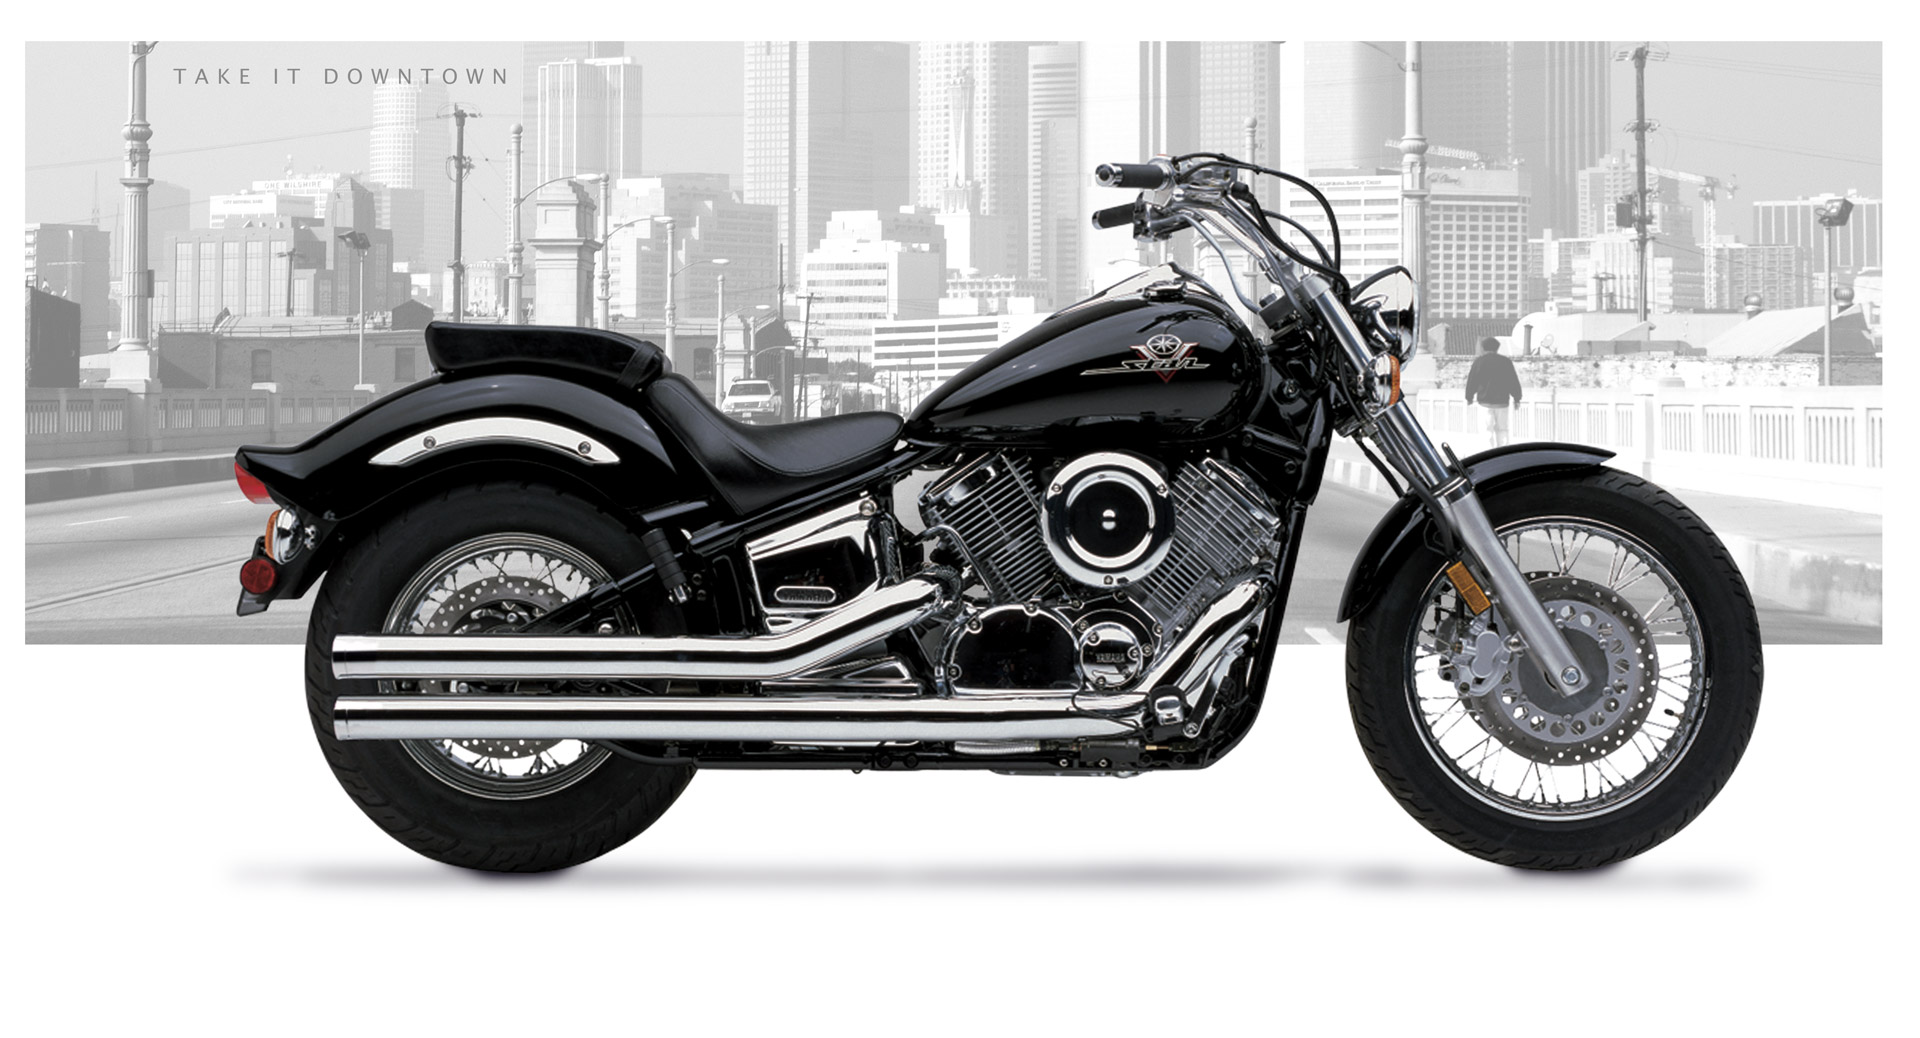 Yamaha V Star 1100 1999-09 Motorcycle Exhaust | Hard-Krome